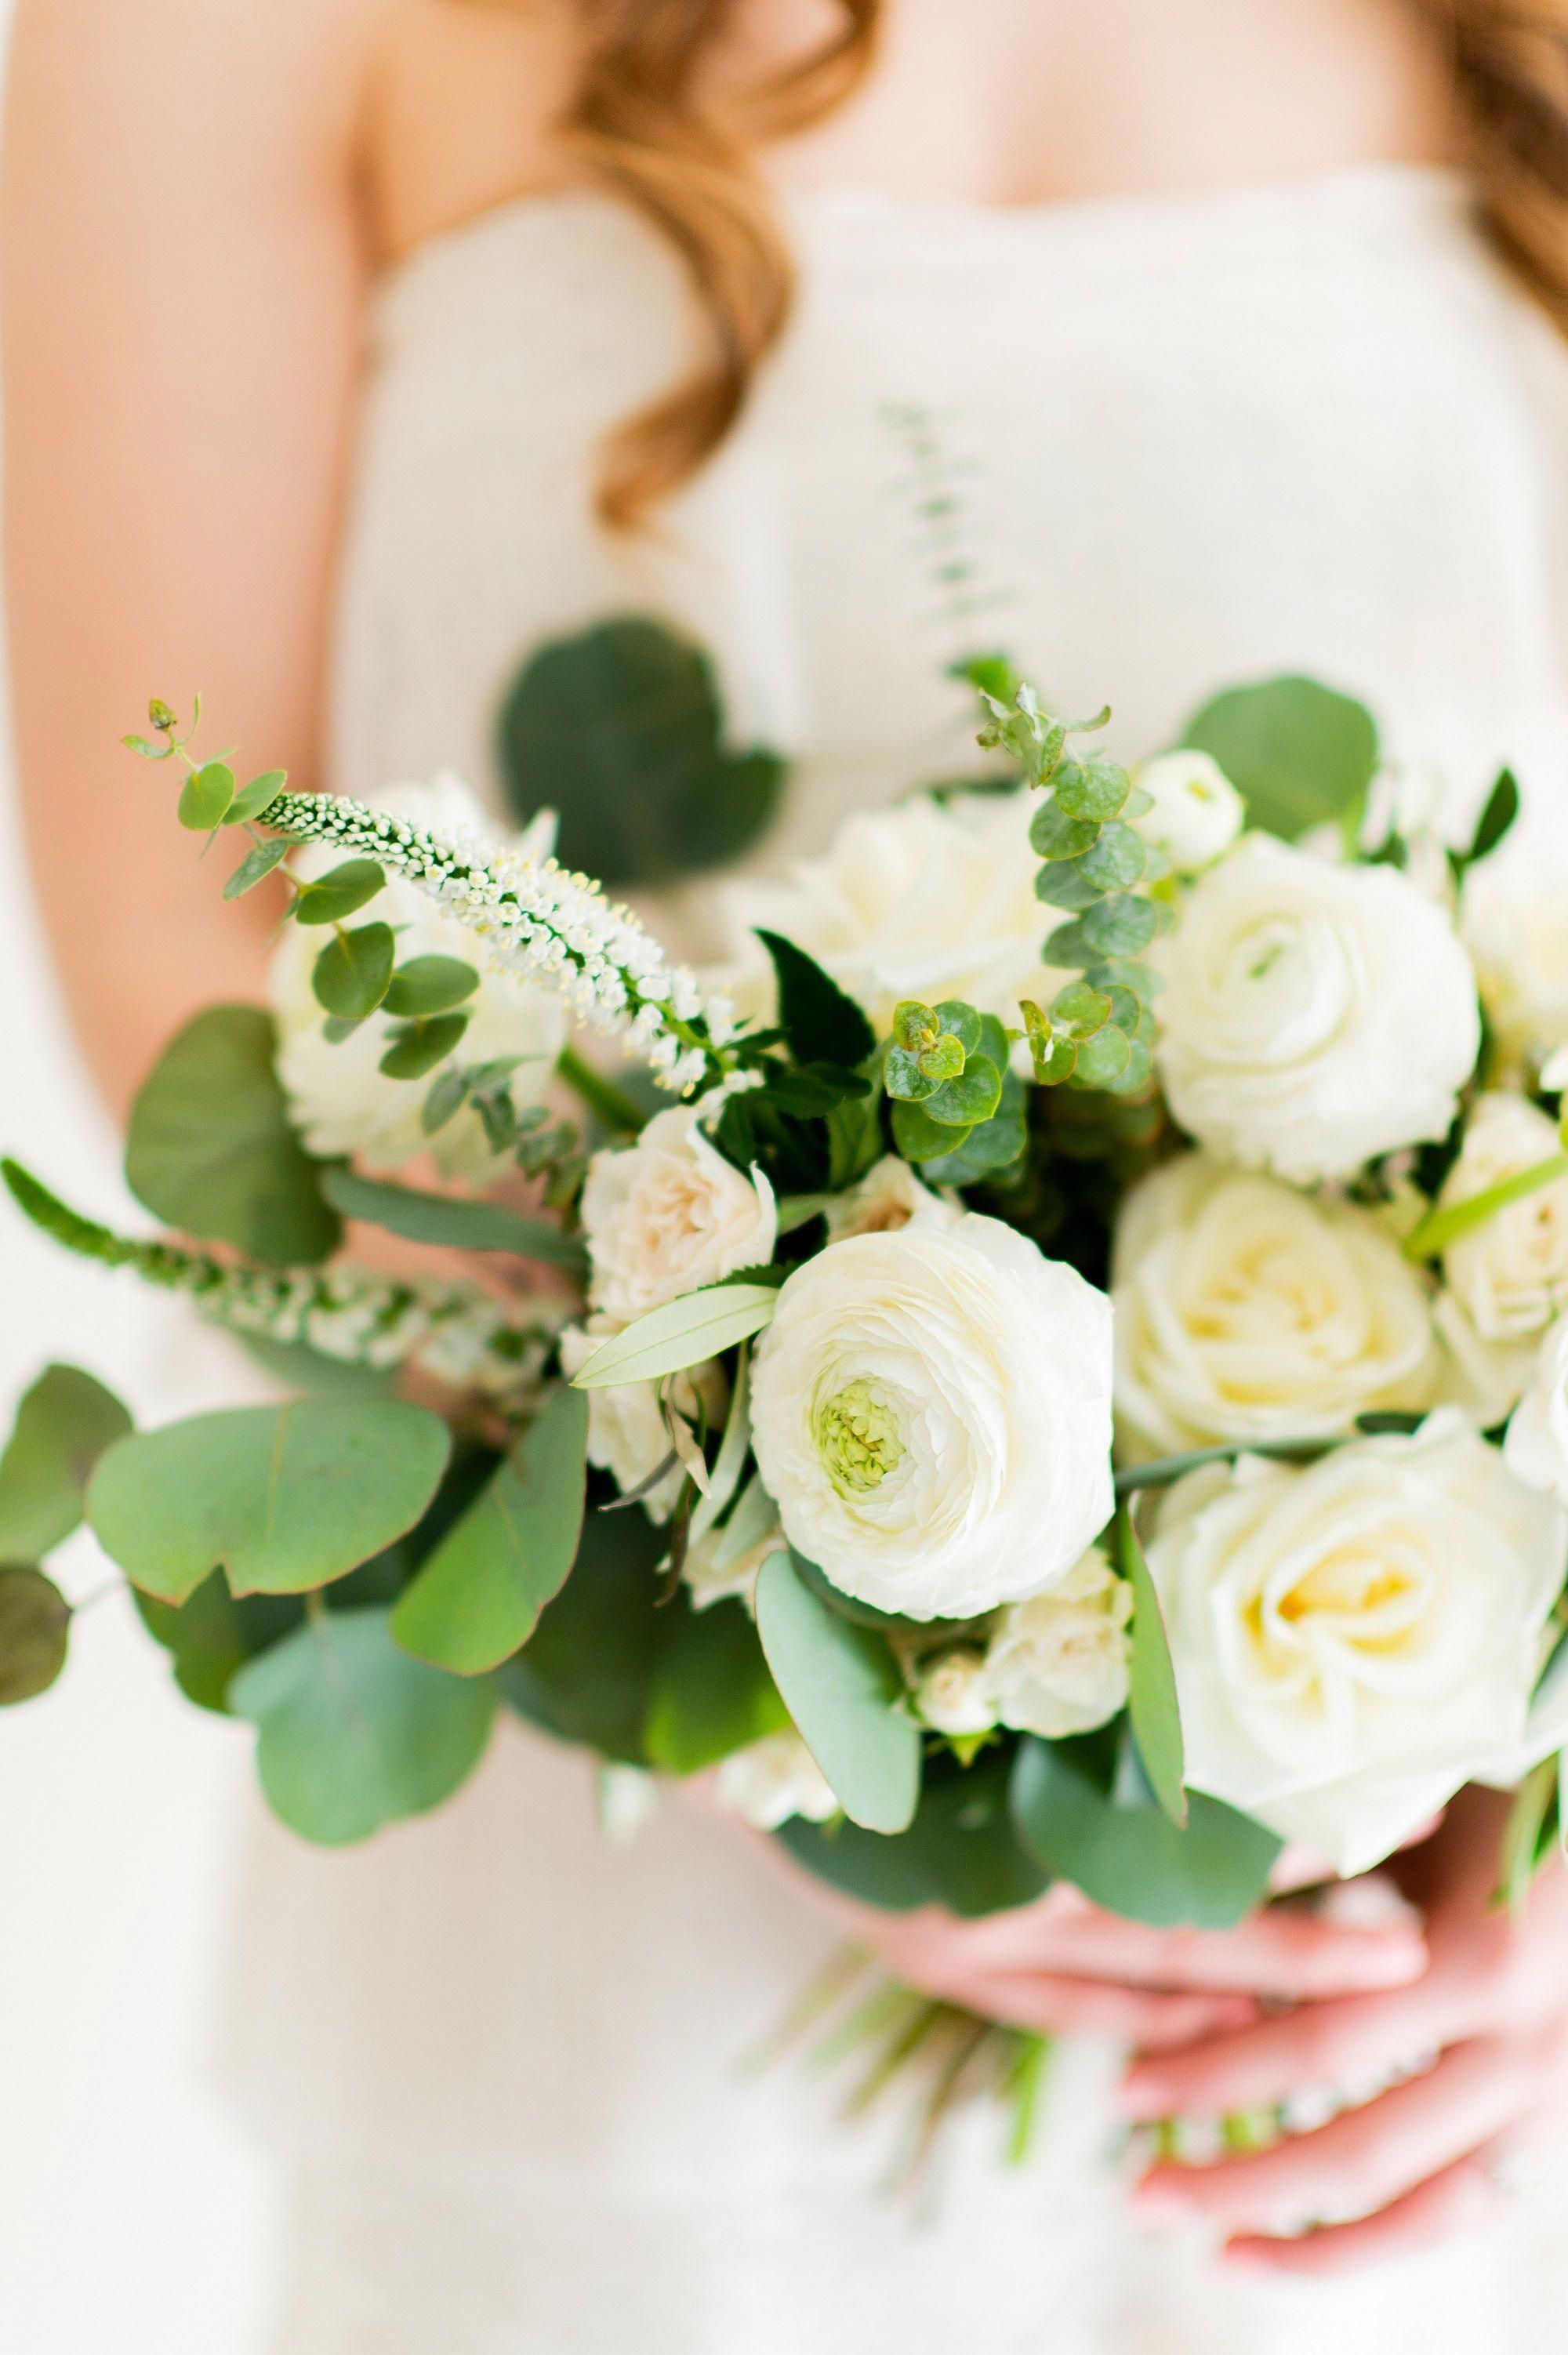 Ranunculus Asiaticus Care Ranunculus Wedding Flower Packages Cream Bridal Bouquet Bridal Bouquet Flowers